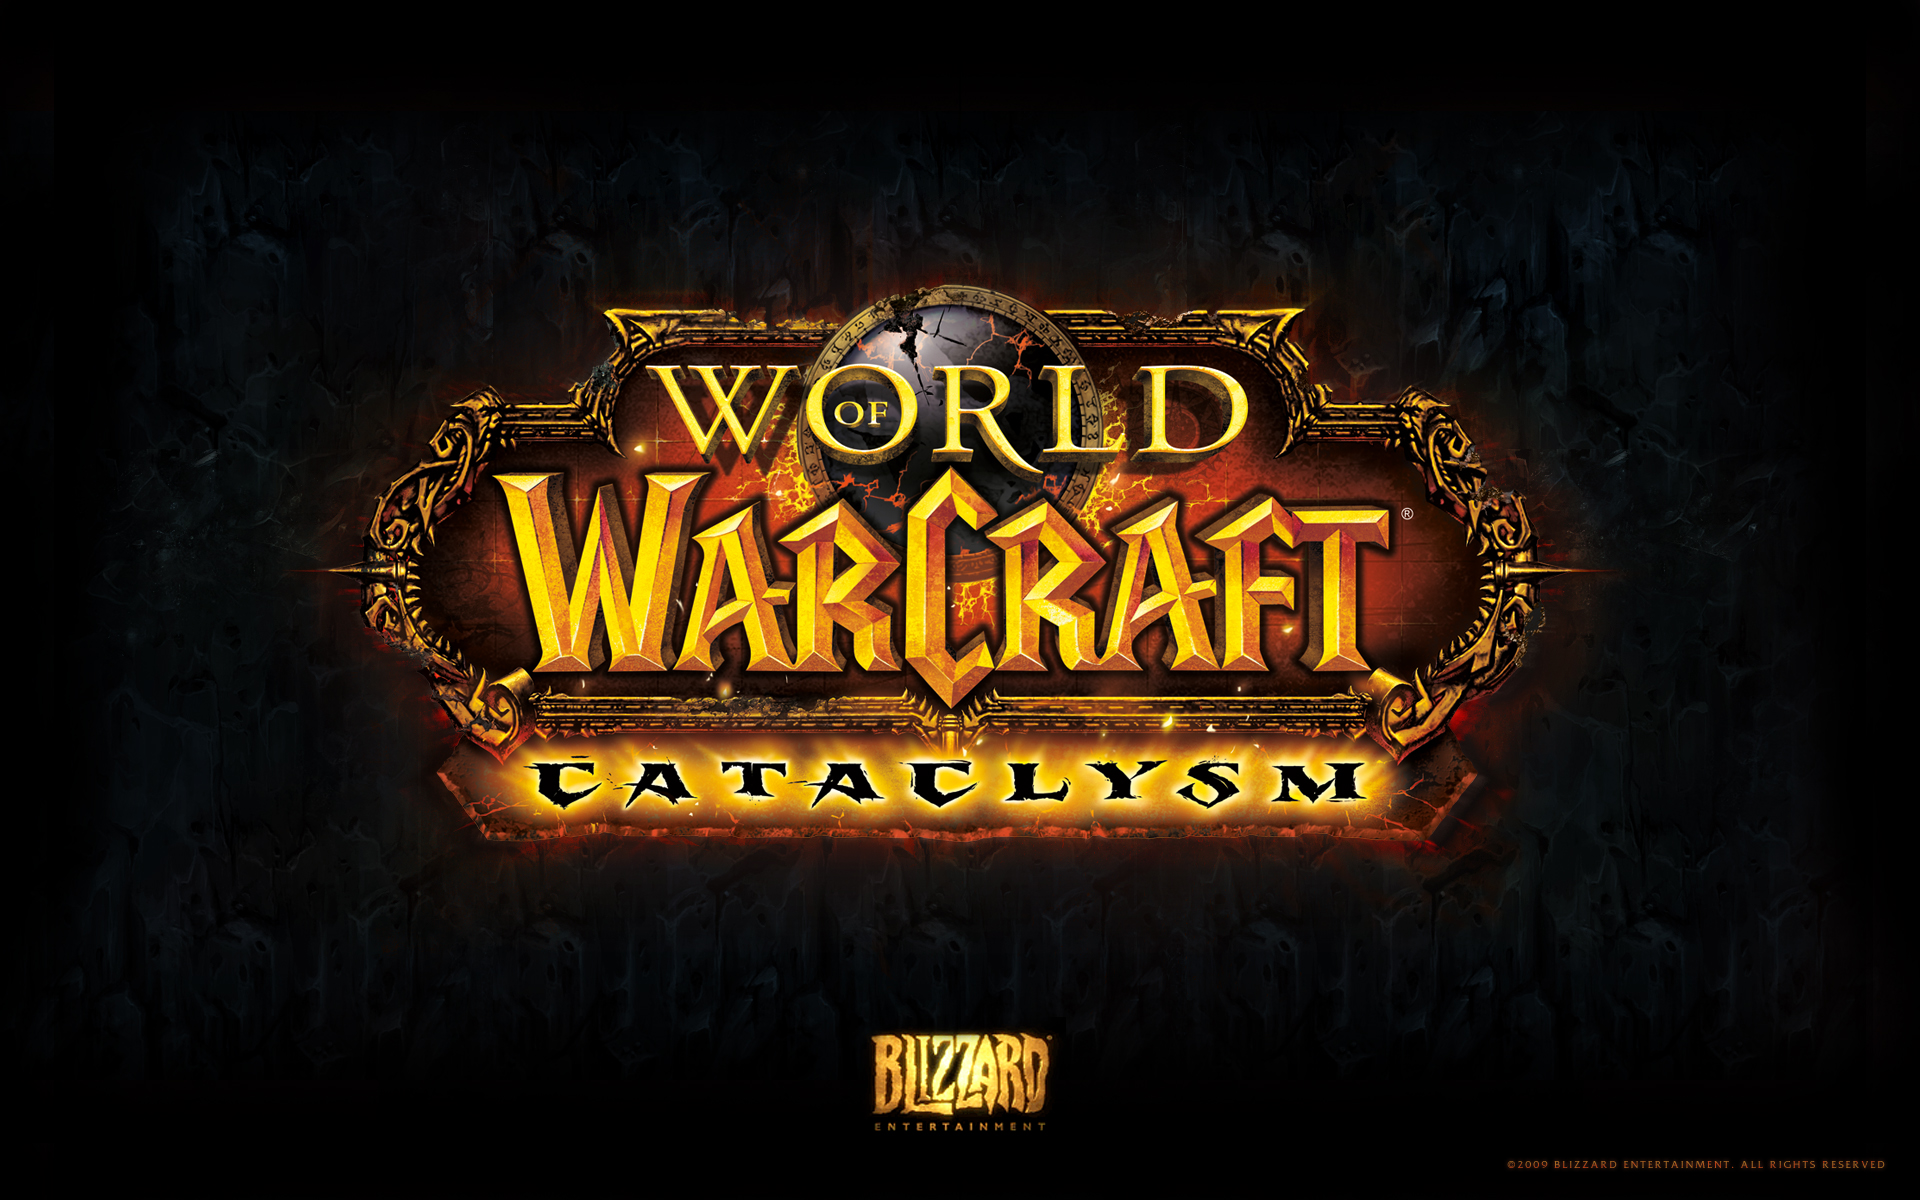 http://2.bp.blogspot.com/_W1ueYt1O3xs/TMrtPIRgfMI/AAAAAAAAW9Y/HkYrphazoaU/d/World%2525252Bof%2525252BWarcraft-%2525252BCataclysm%2525252BWallpapers%2525252B(2).jpg